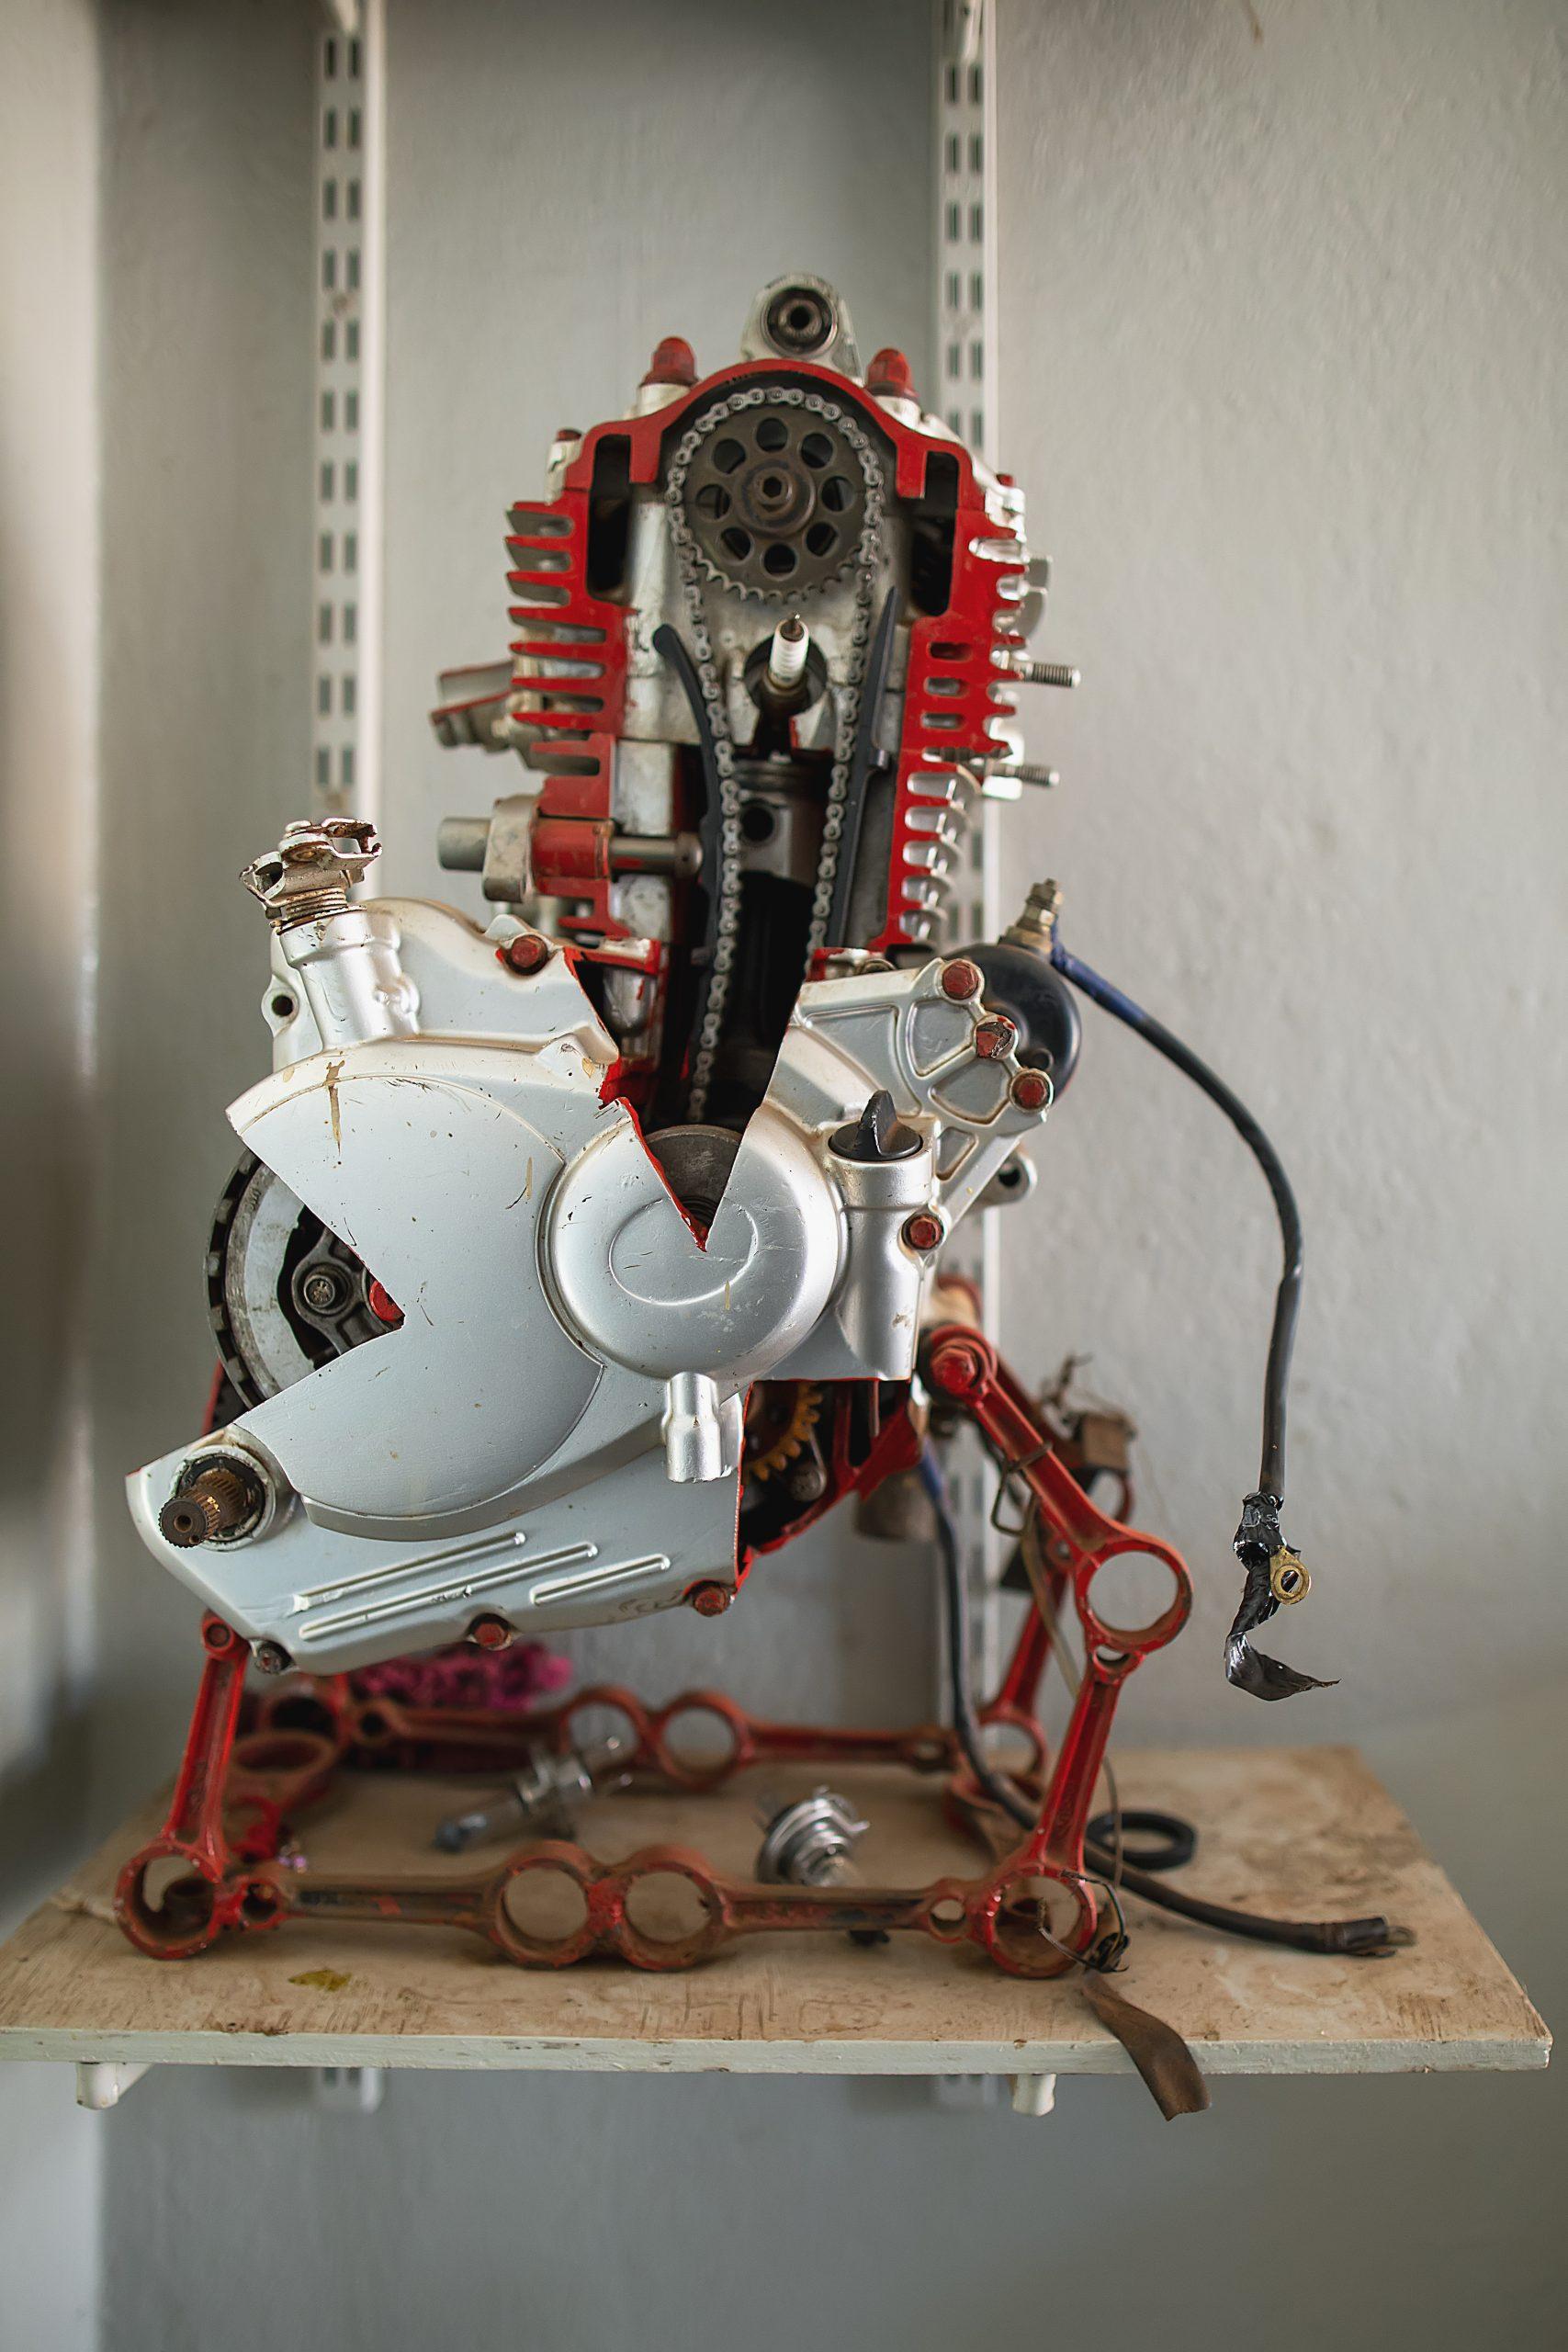 A bike engine